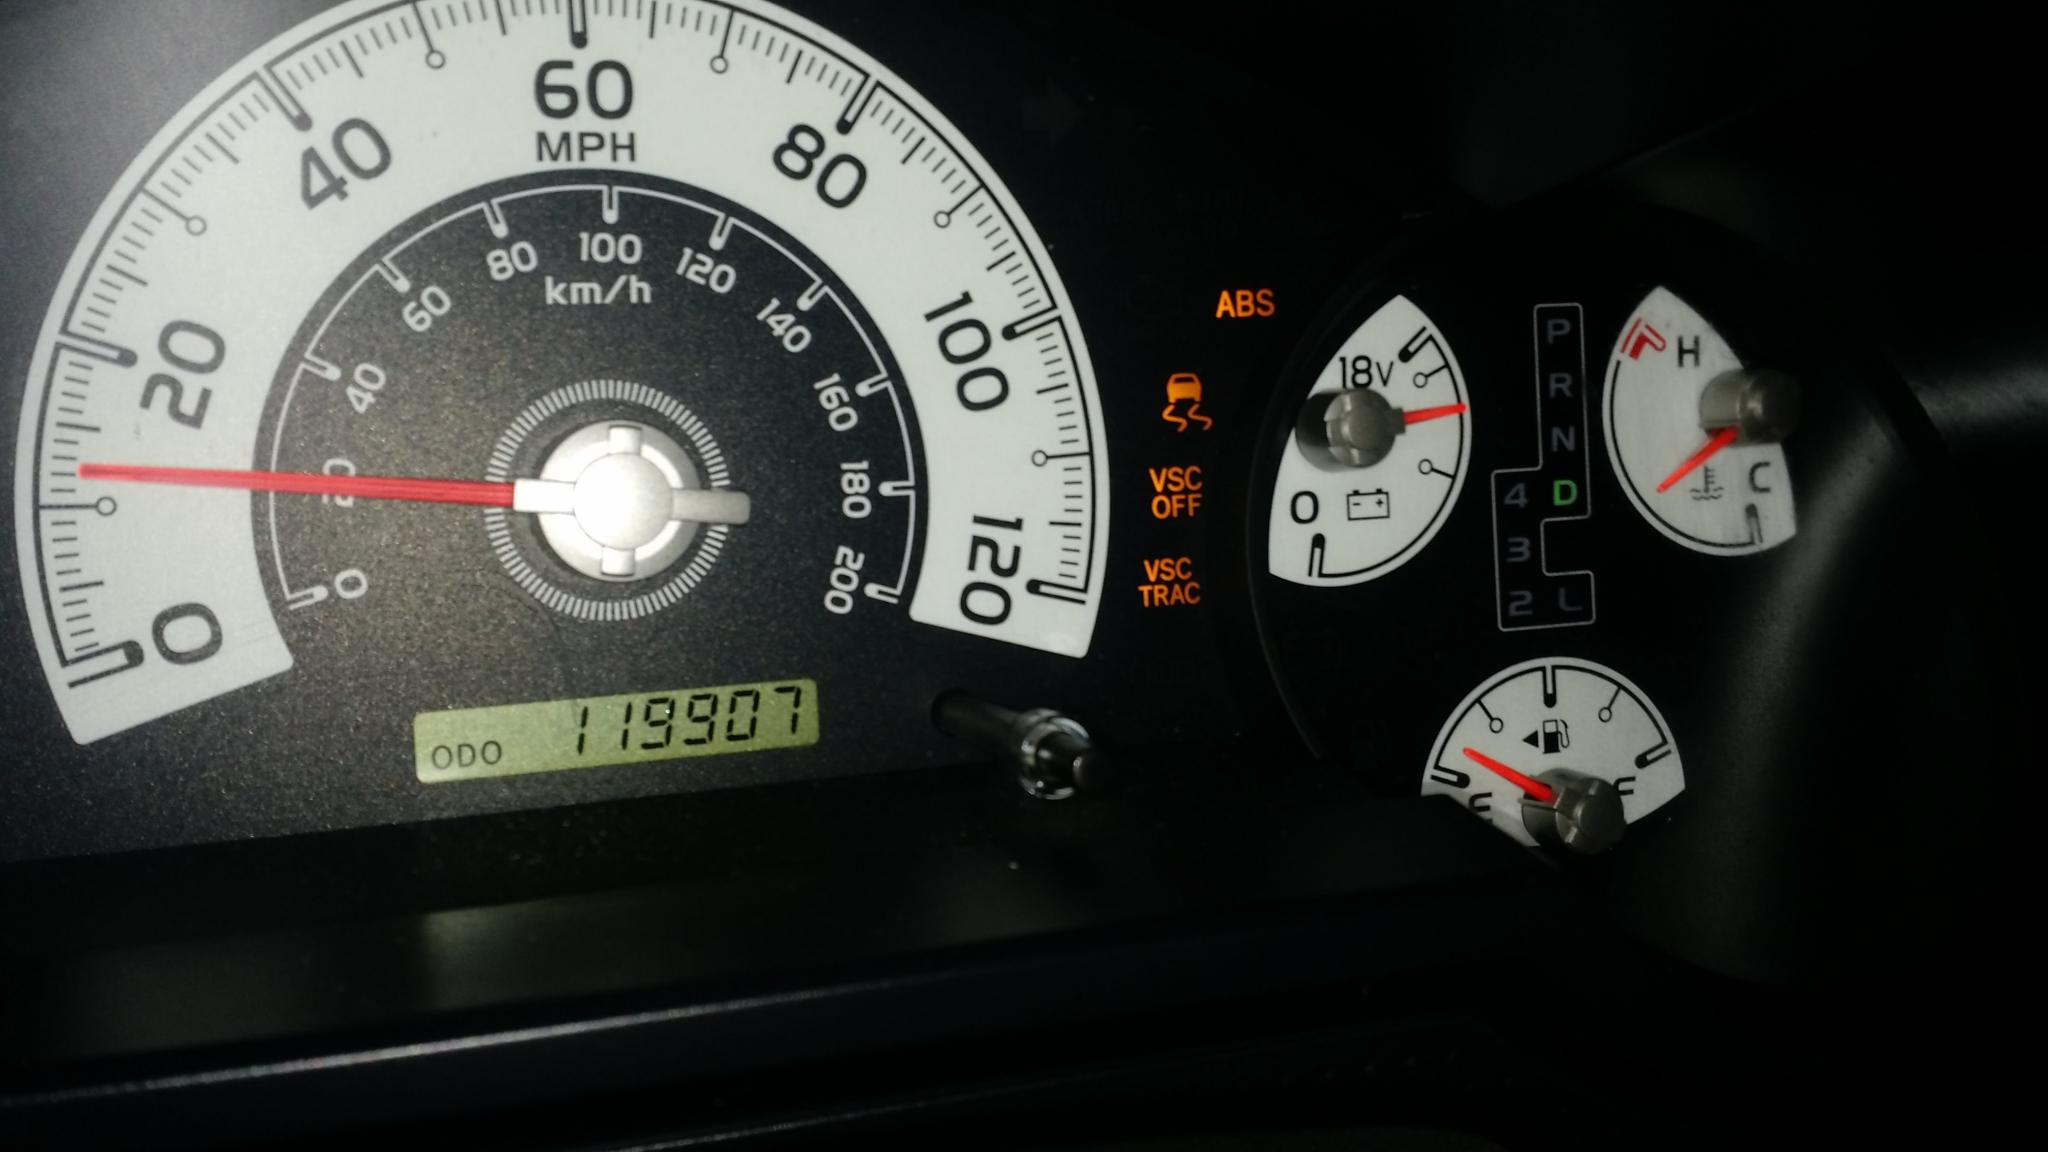 2007 Toyota Fj Cruiser Light Auto Turn Off System Diagram